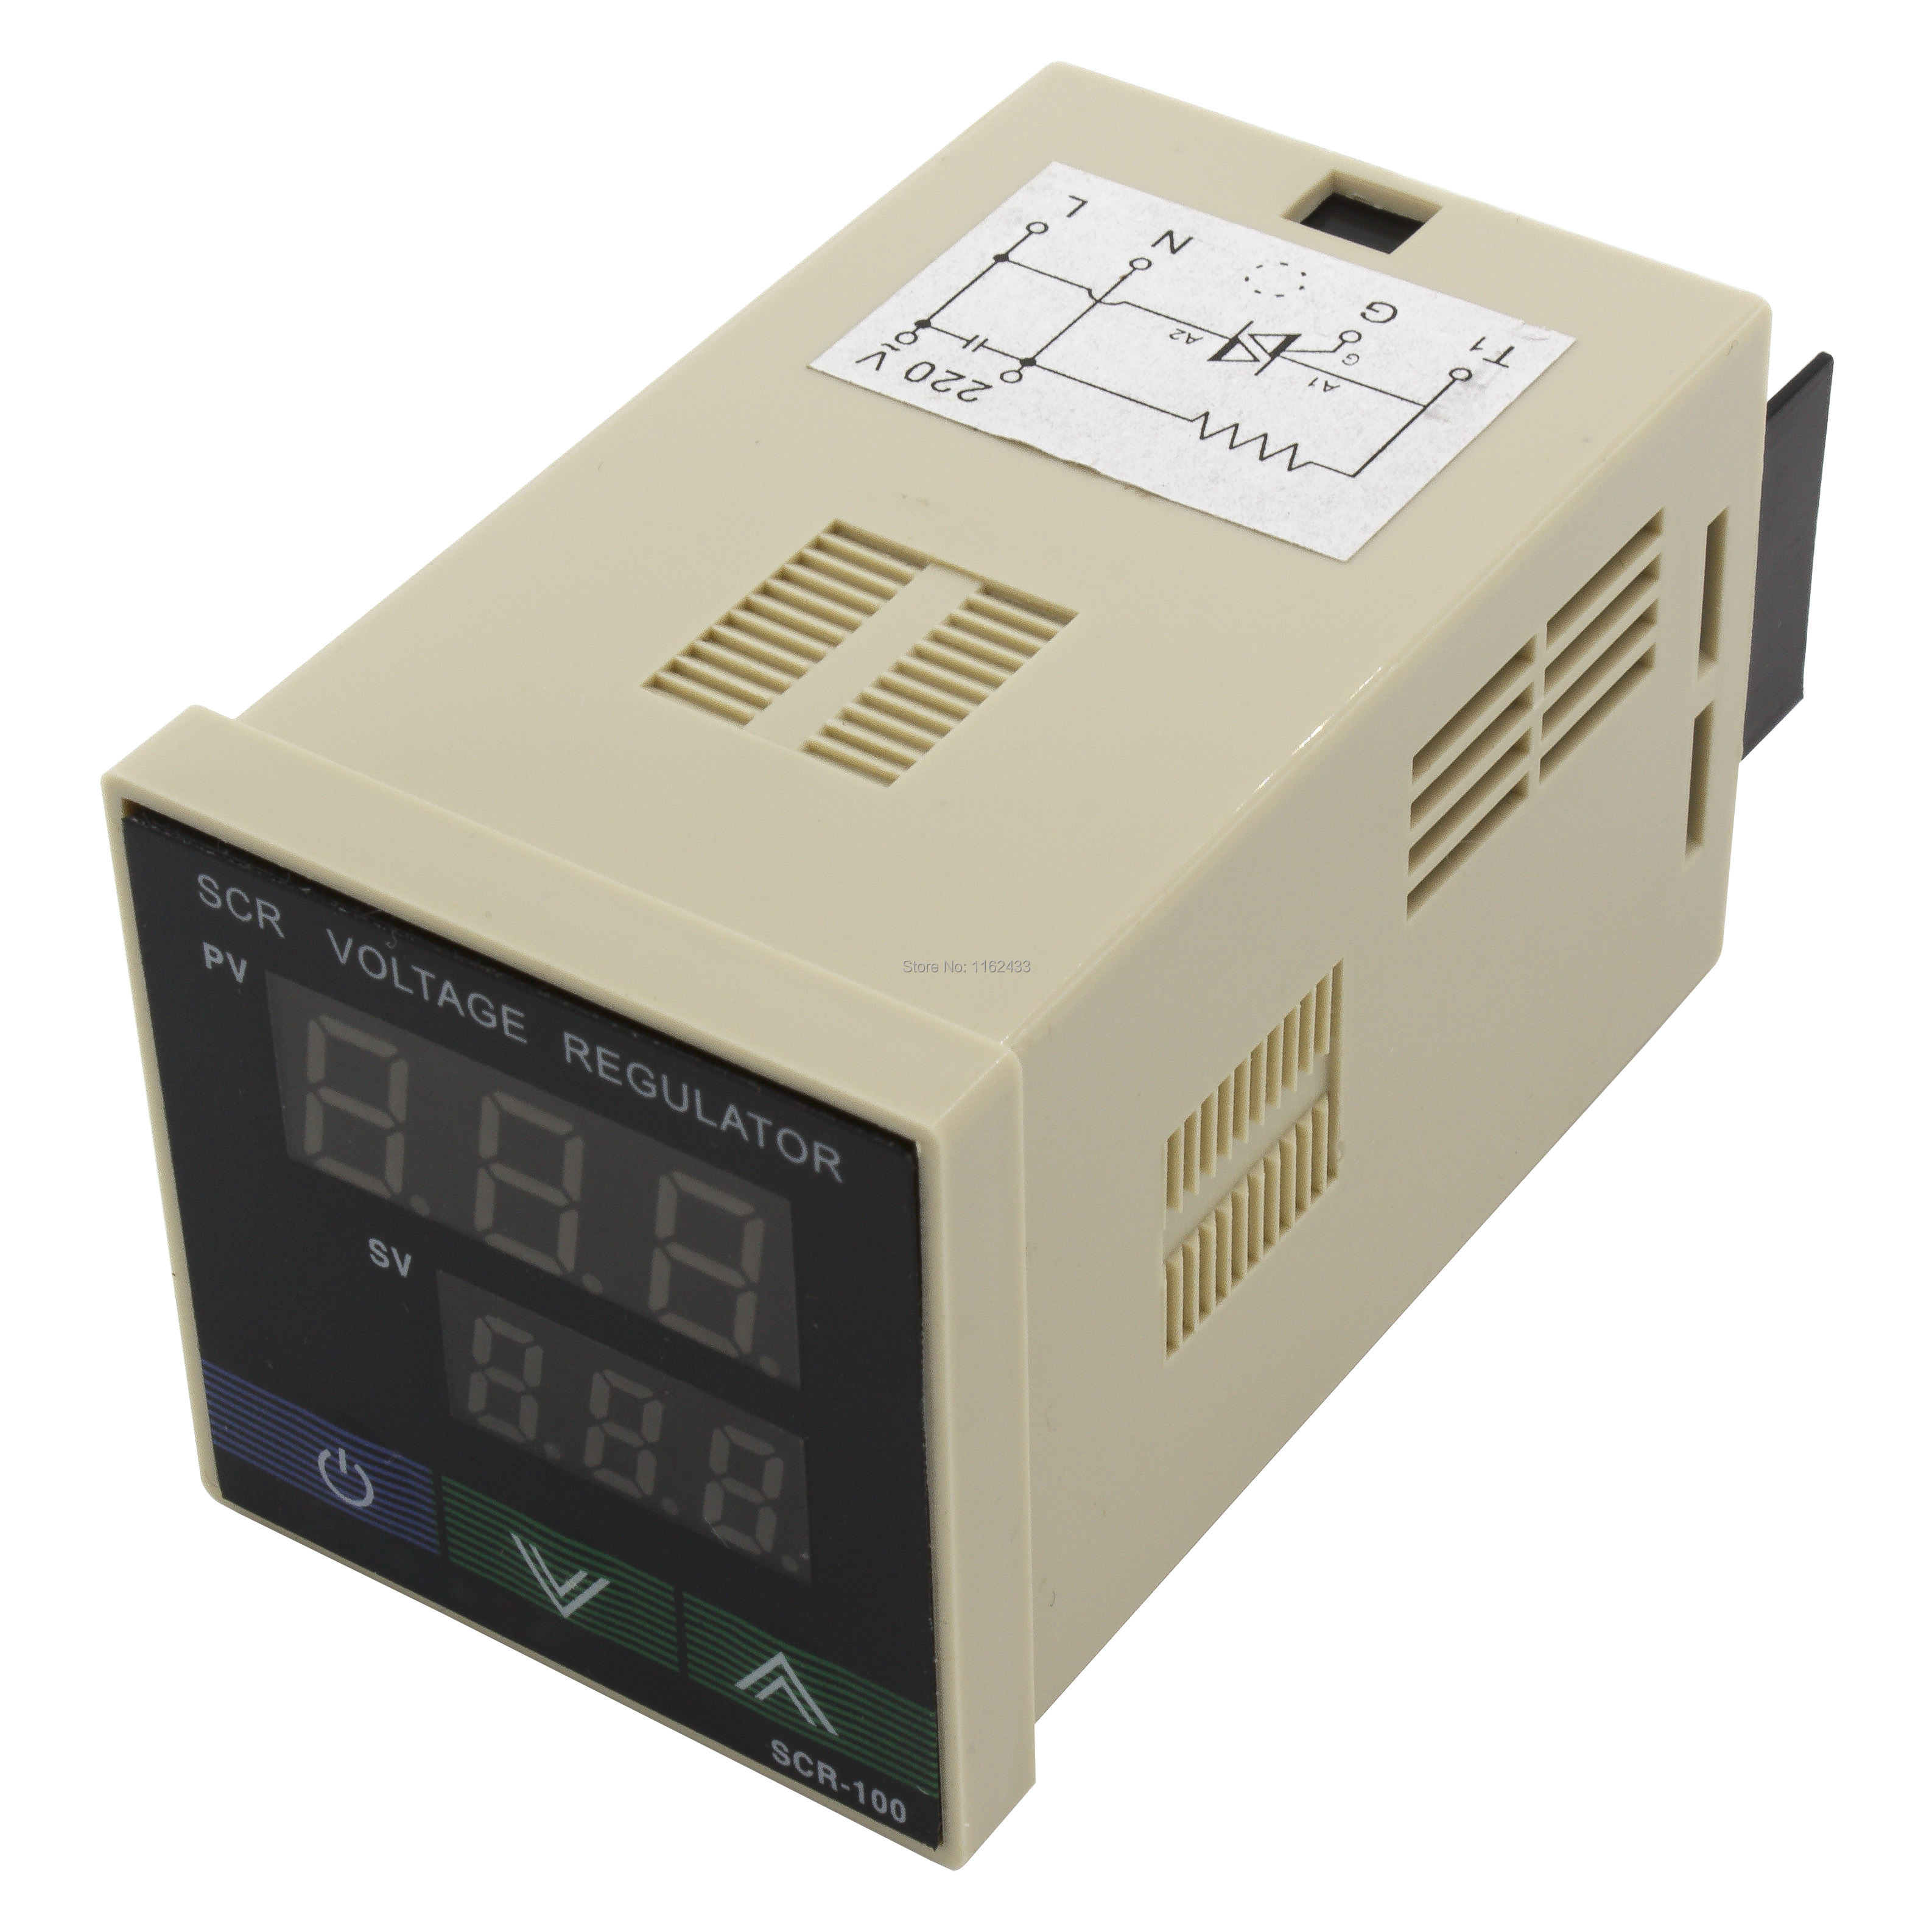 SCR-100 Digital SCR Voltage Regulator Special For Blow Molding Machine